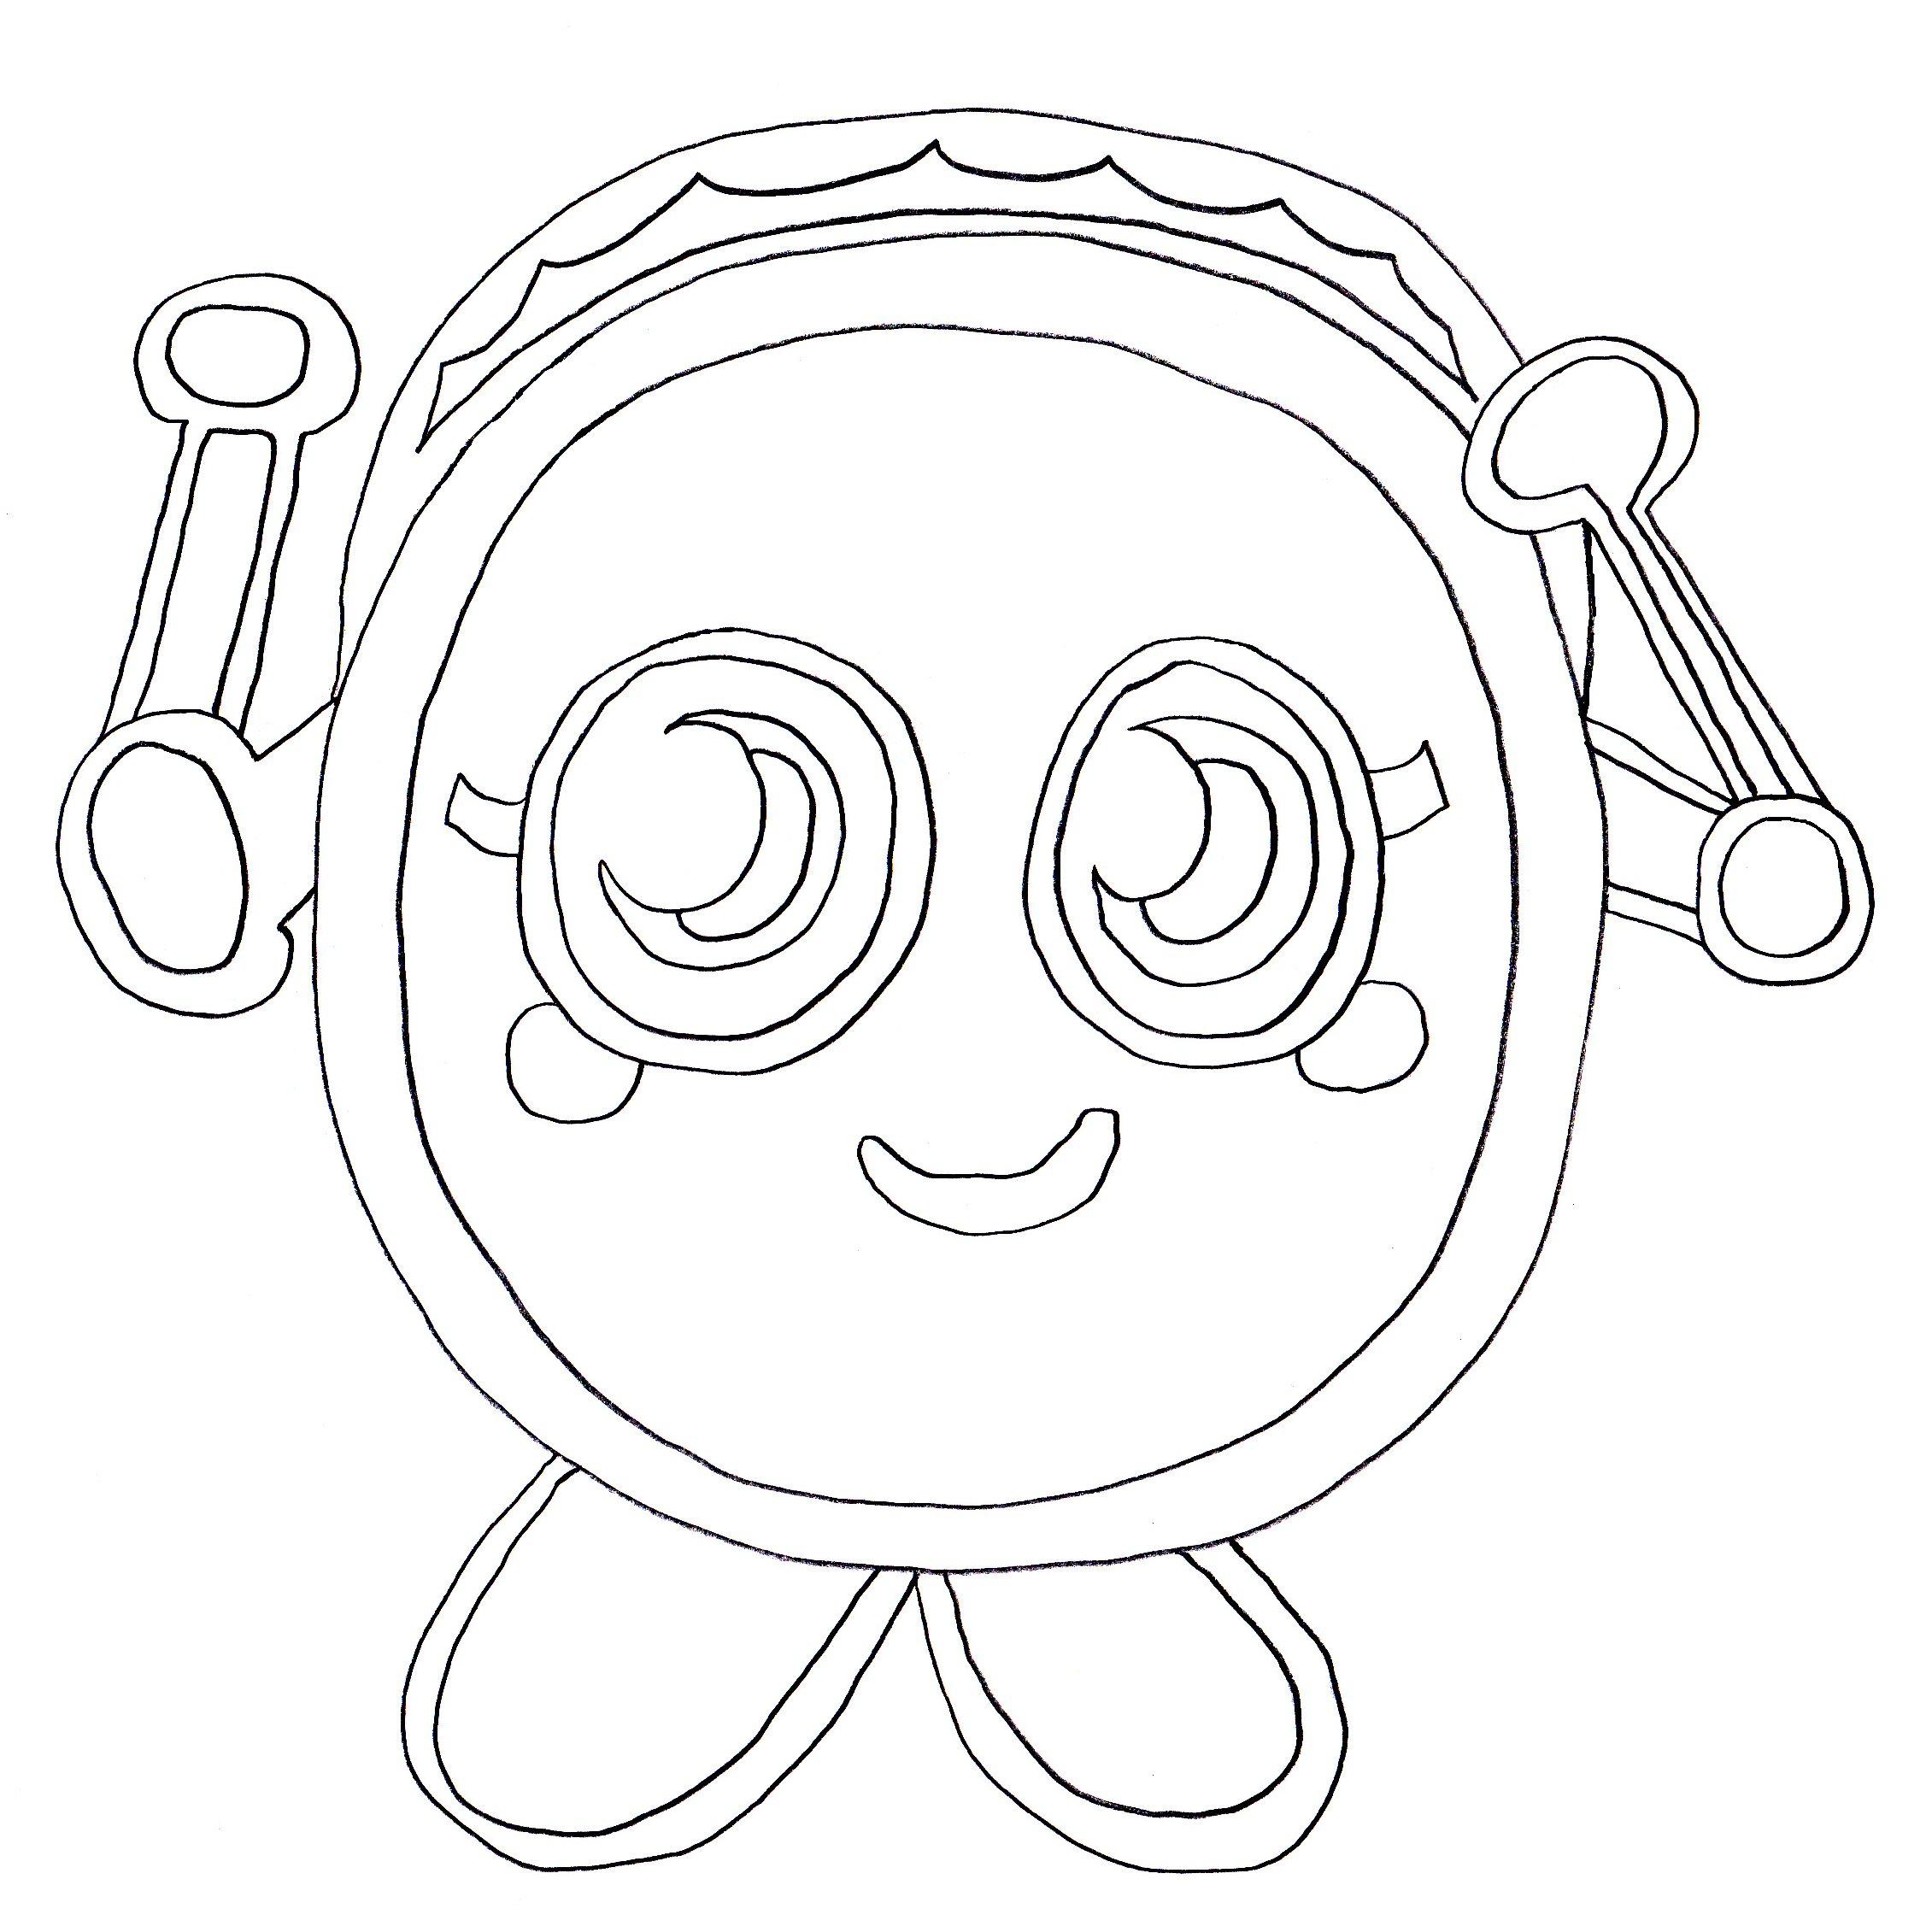 2261x2261 Moshi Monsterstune Teller Stuff Zoe Wants To Pin